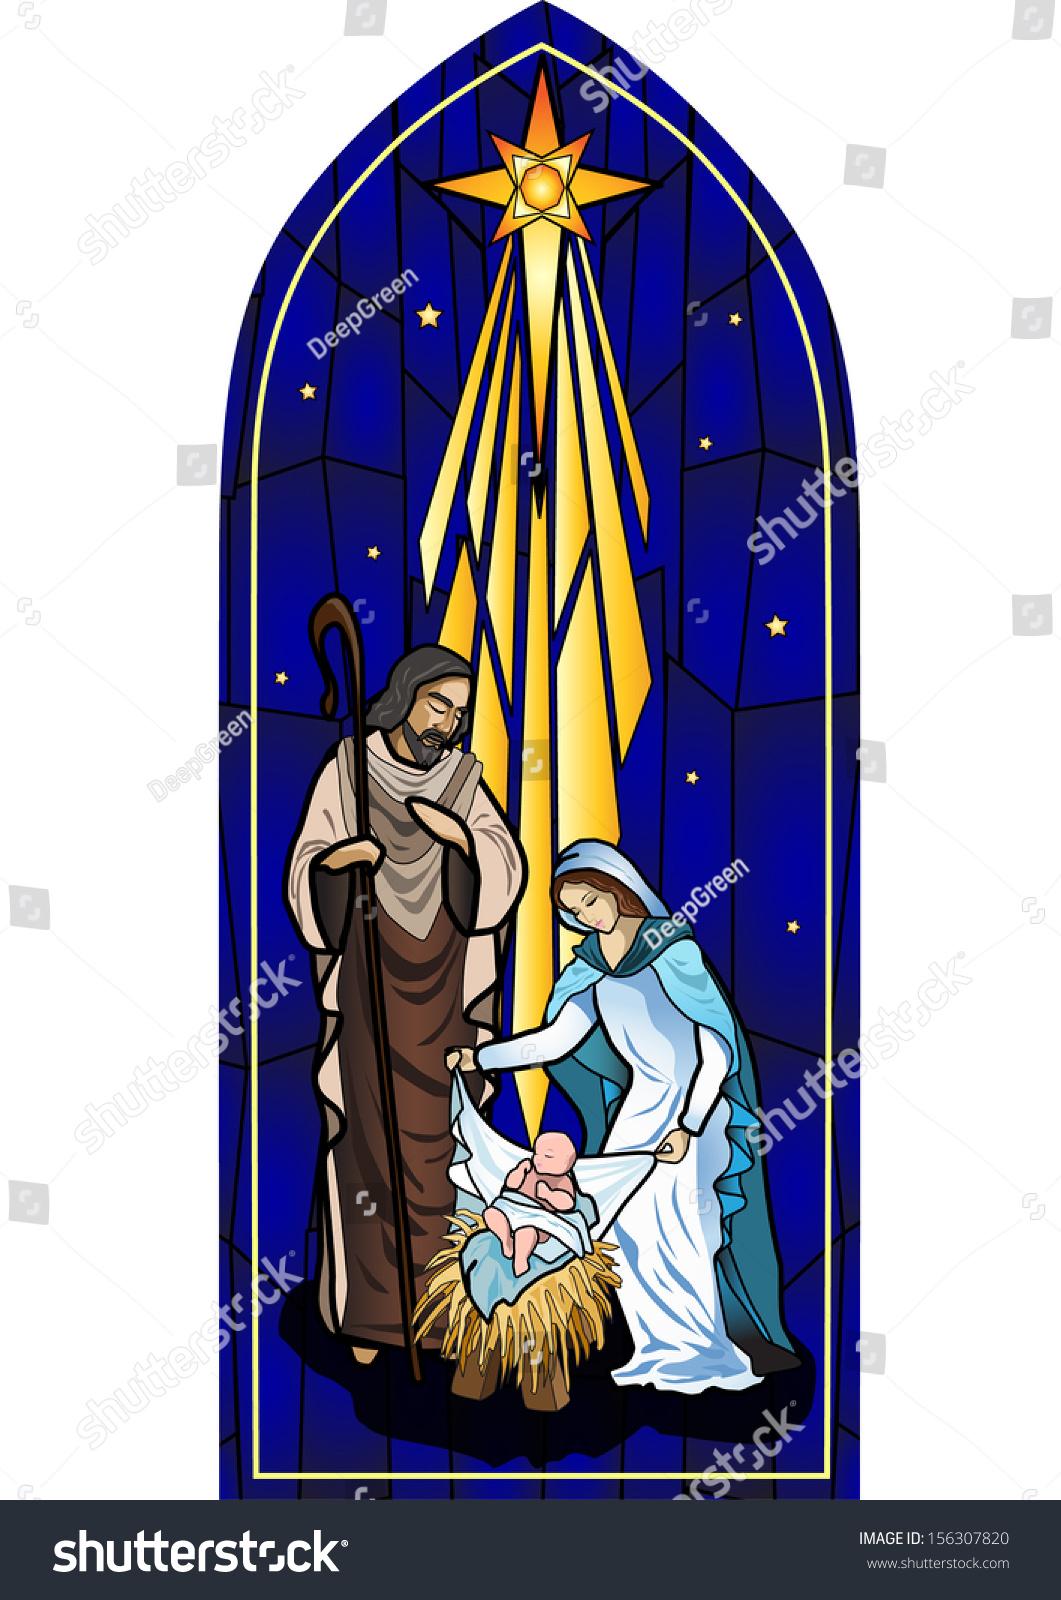 Vector Illustration Holy Family Nativity Birth Stock ...  Jesus Christ Birth Clipart